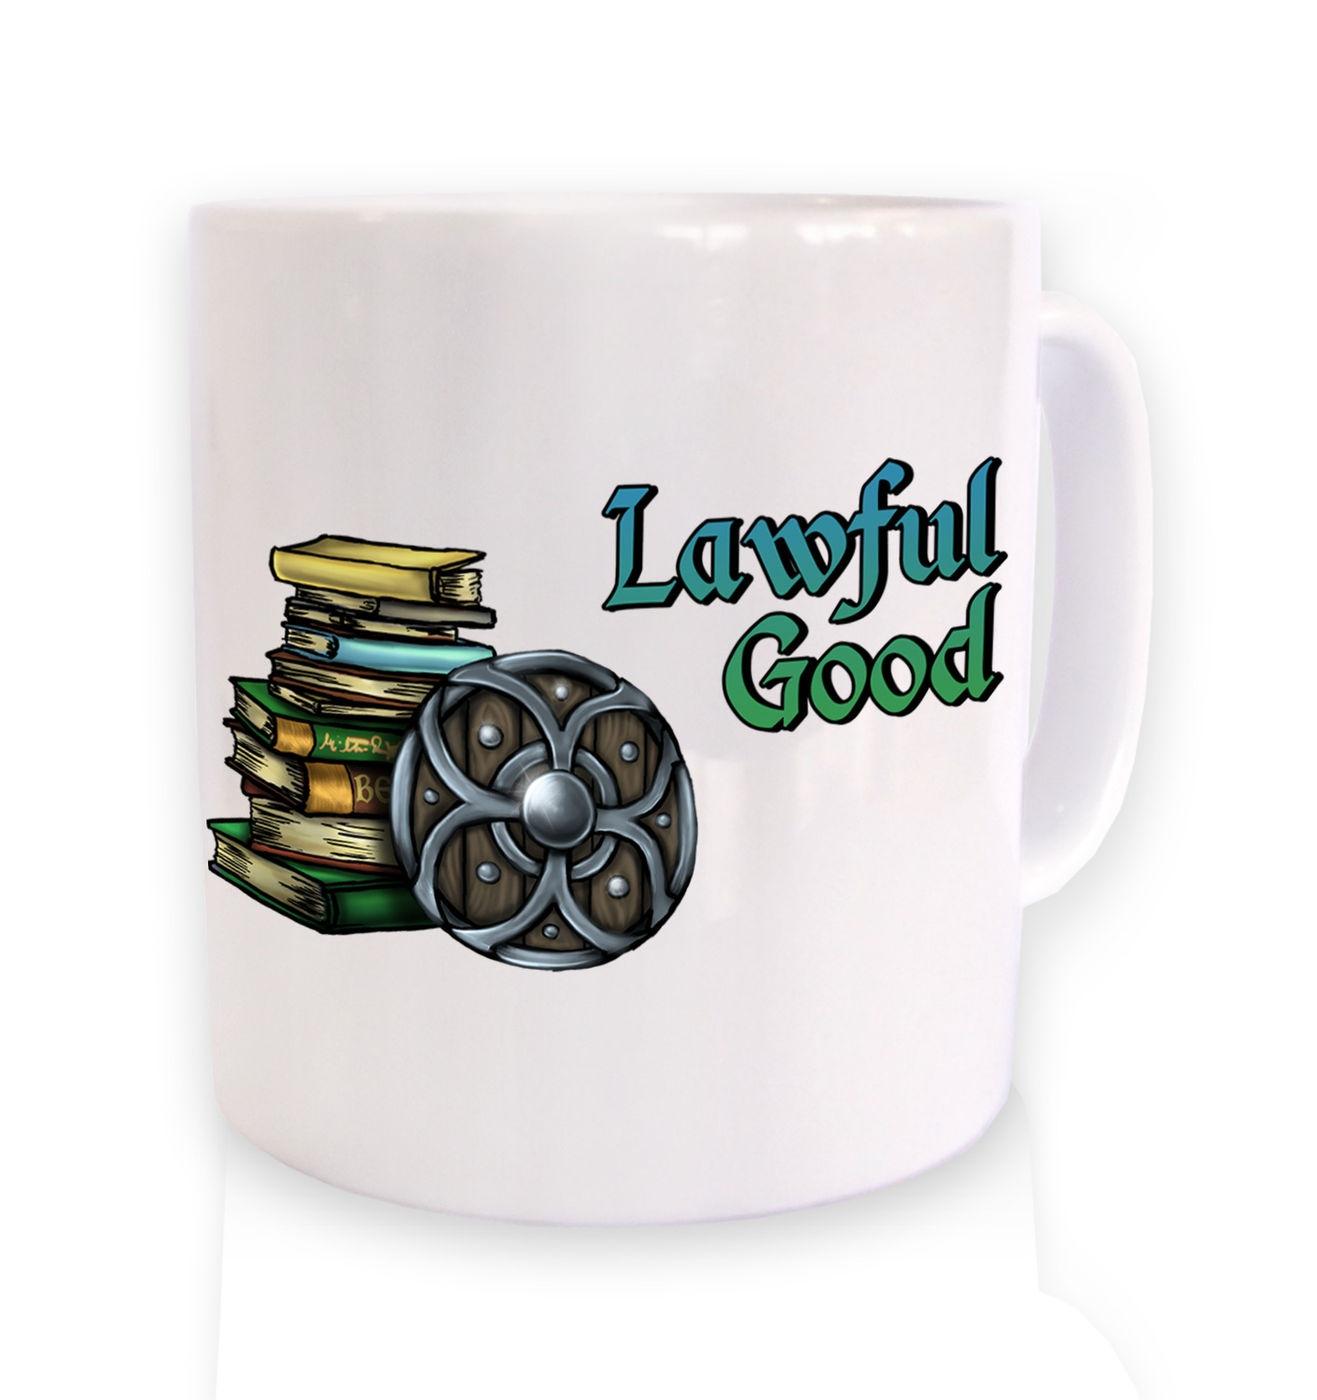 Cartoon Alignment Lawful Good ceramic mug